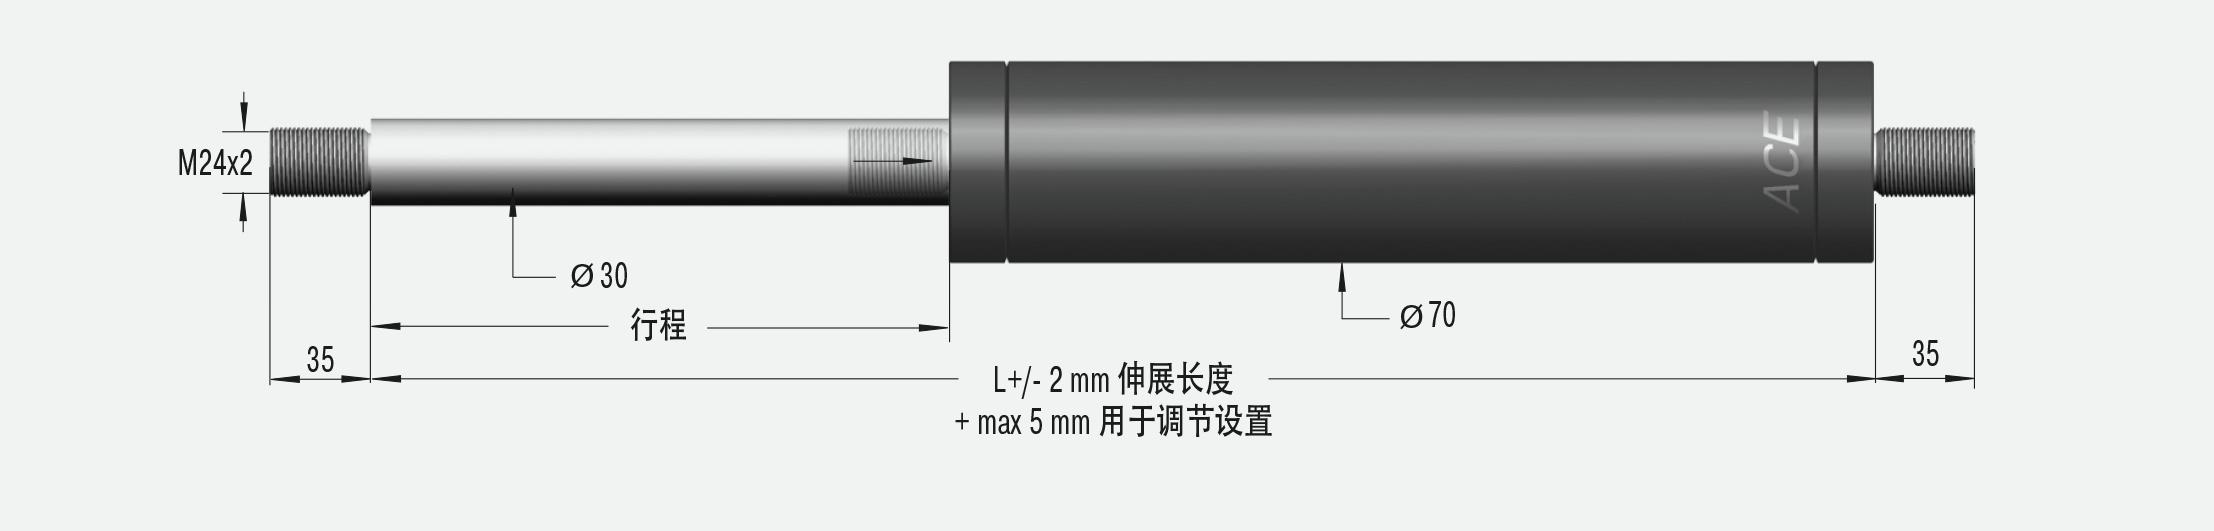 HB-70-100